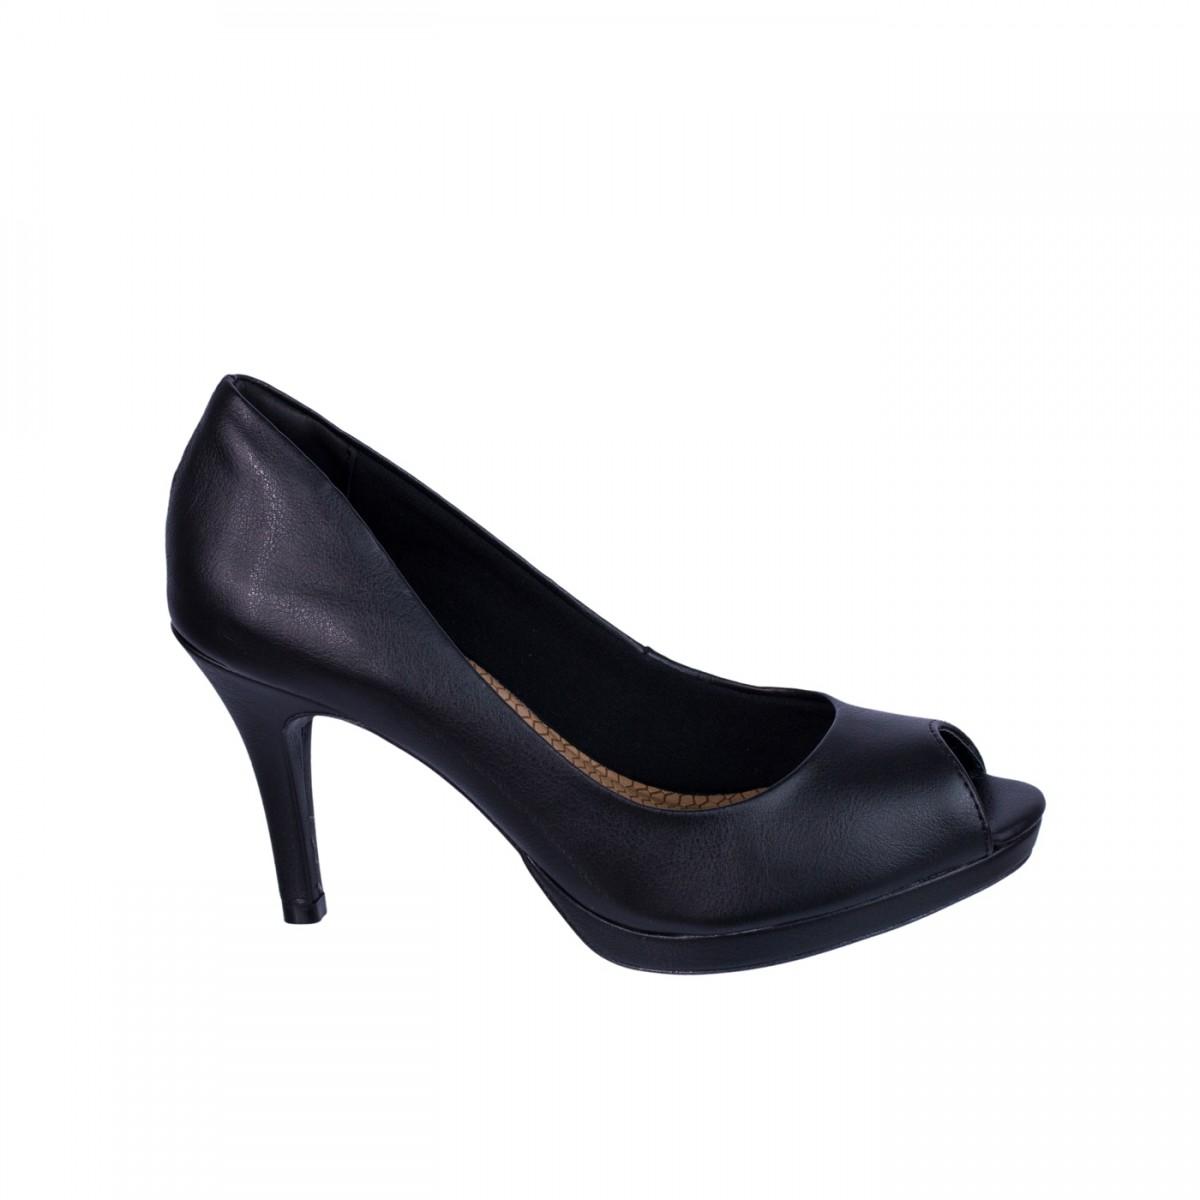 3d2a032e3 Bizz Store - Sapato Peep Toe Feminino Via Marte Napa New